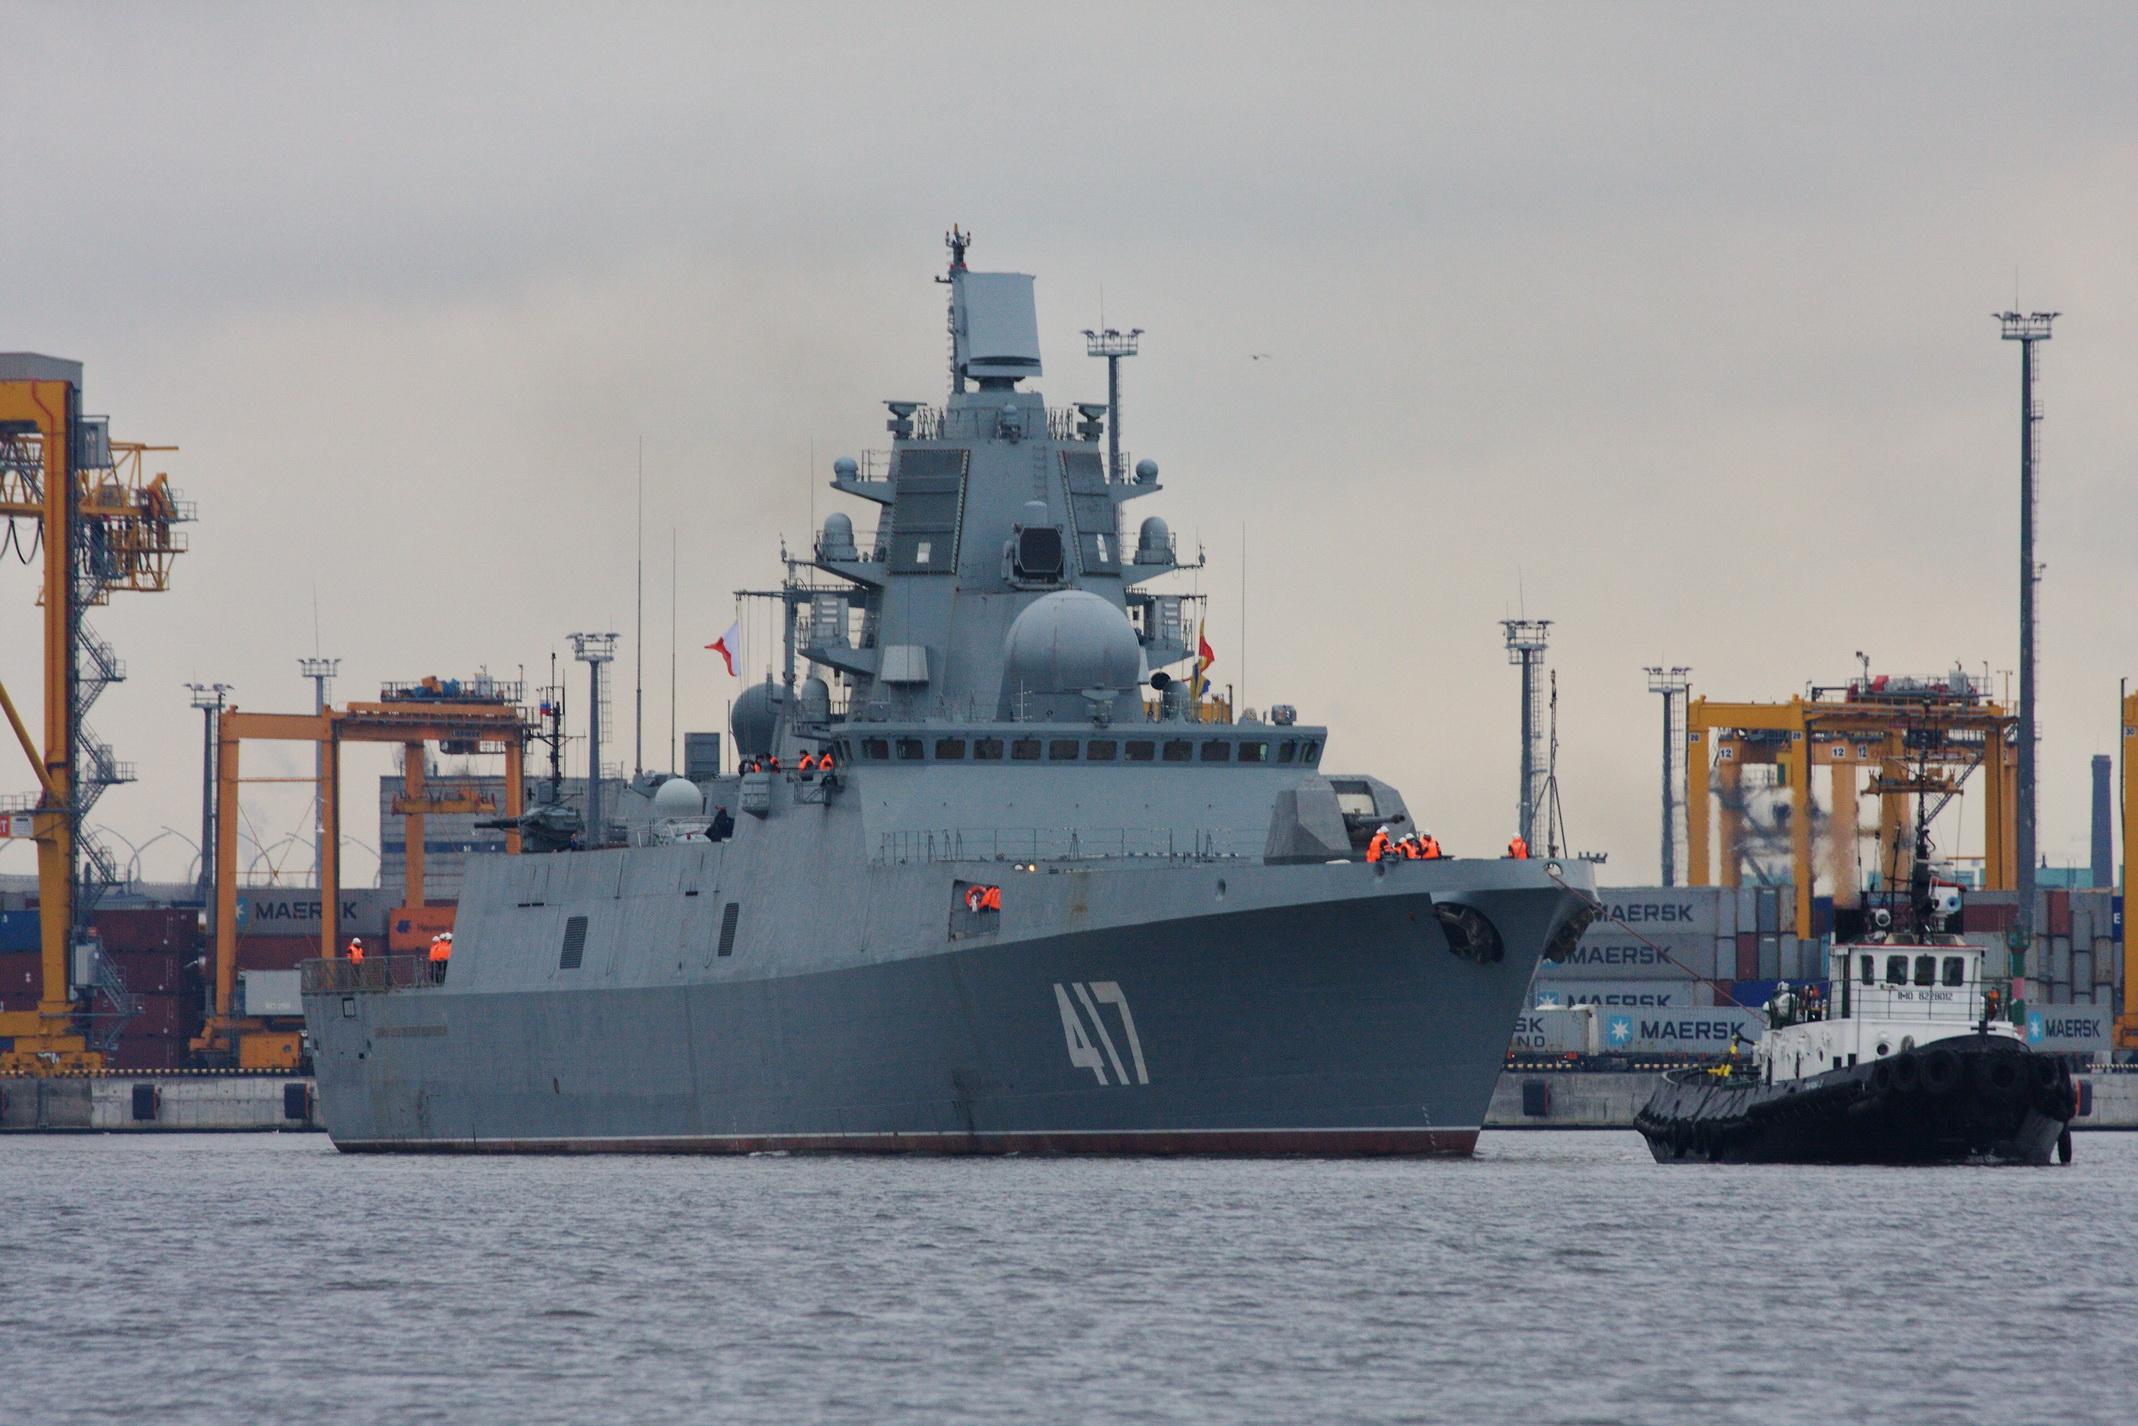 Admiral Gorshkov (22351)